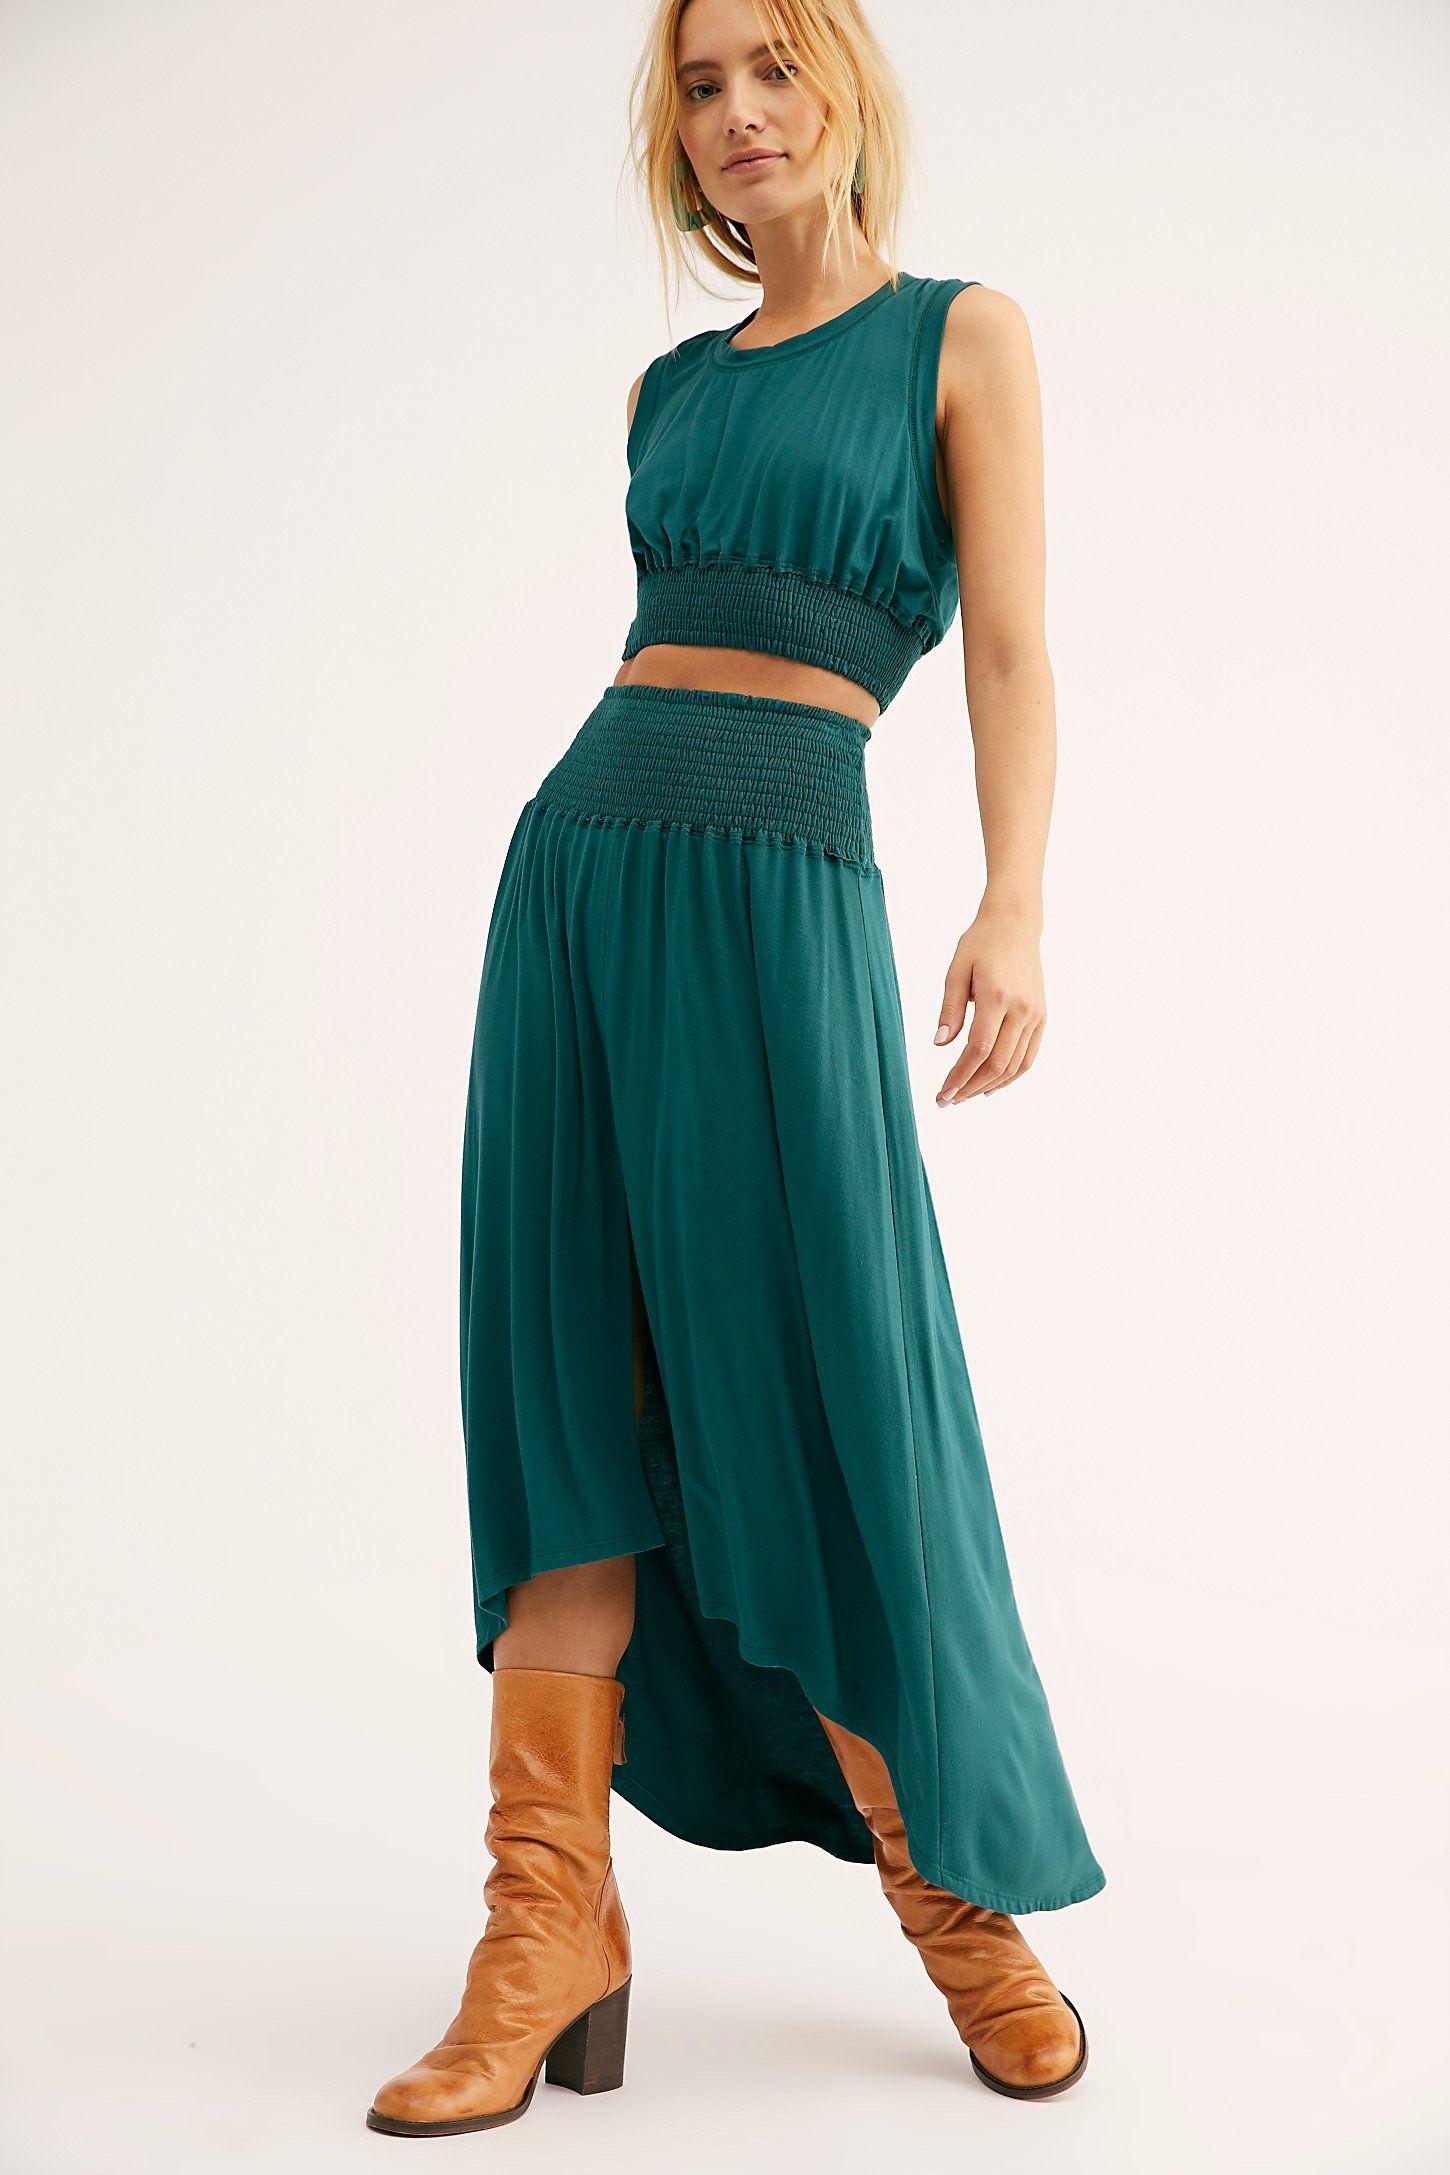 5bcdfbc23e26 Morningside Set | Interesting Clothes | Boho outfits, Fashion, Boho ...